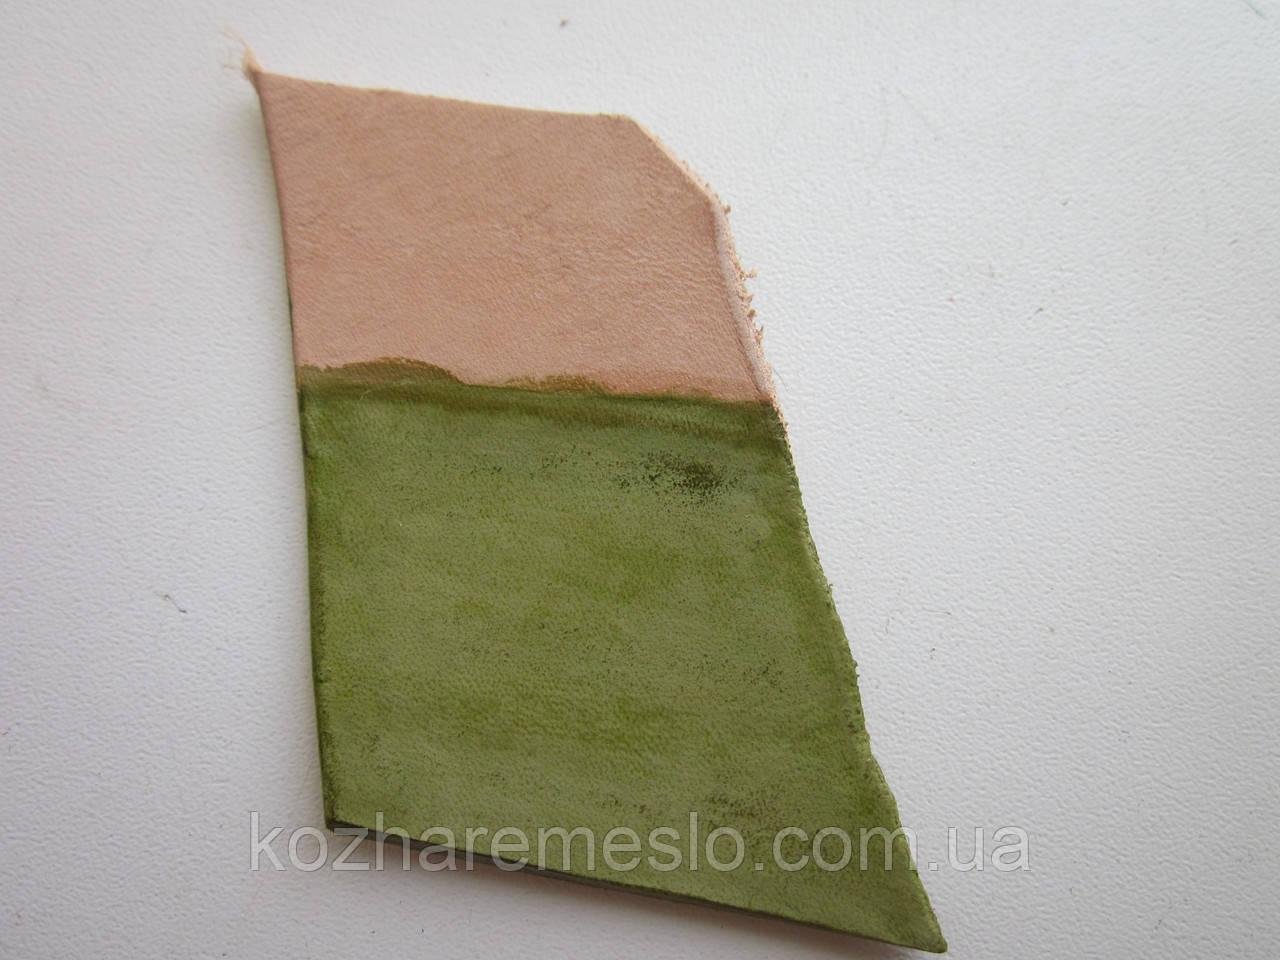 Краска для кожи WATERSTAIN Fenice на водной основе 50 мл зелёная светлая (Италия)